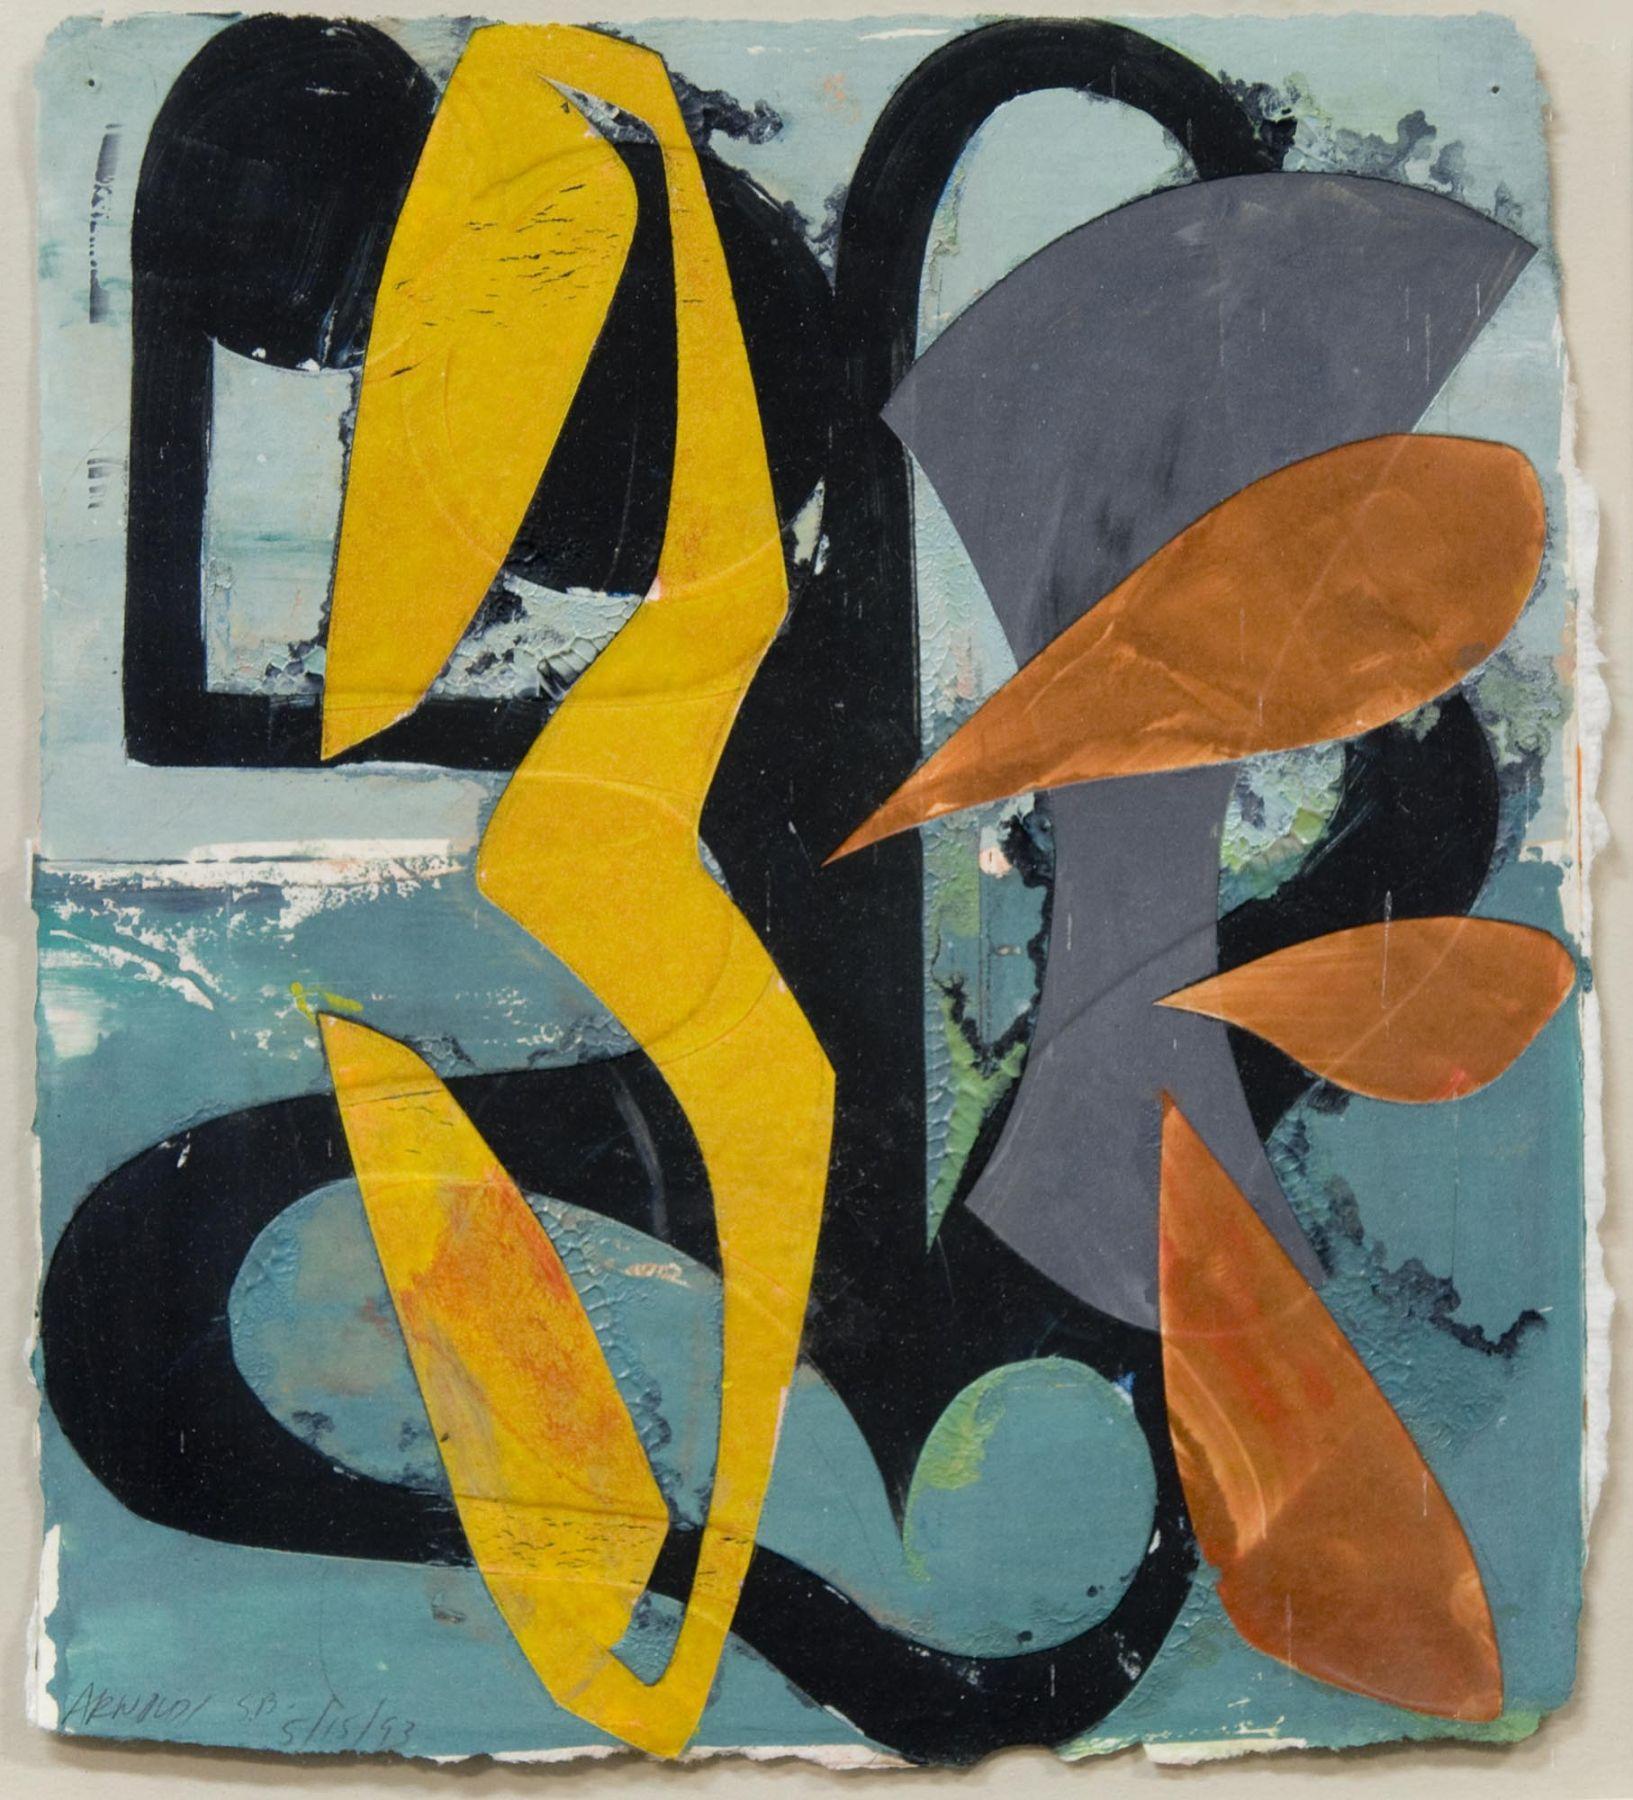 CHARLES ARNOLDI, Untitled, 1993